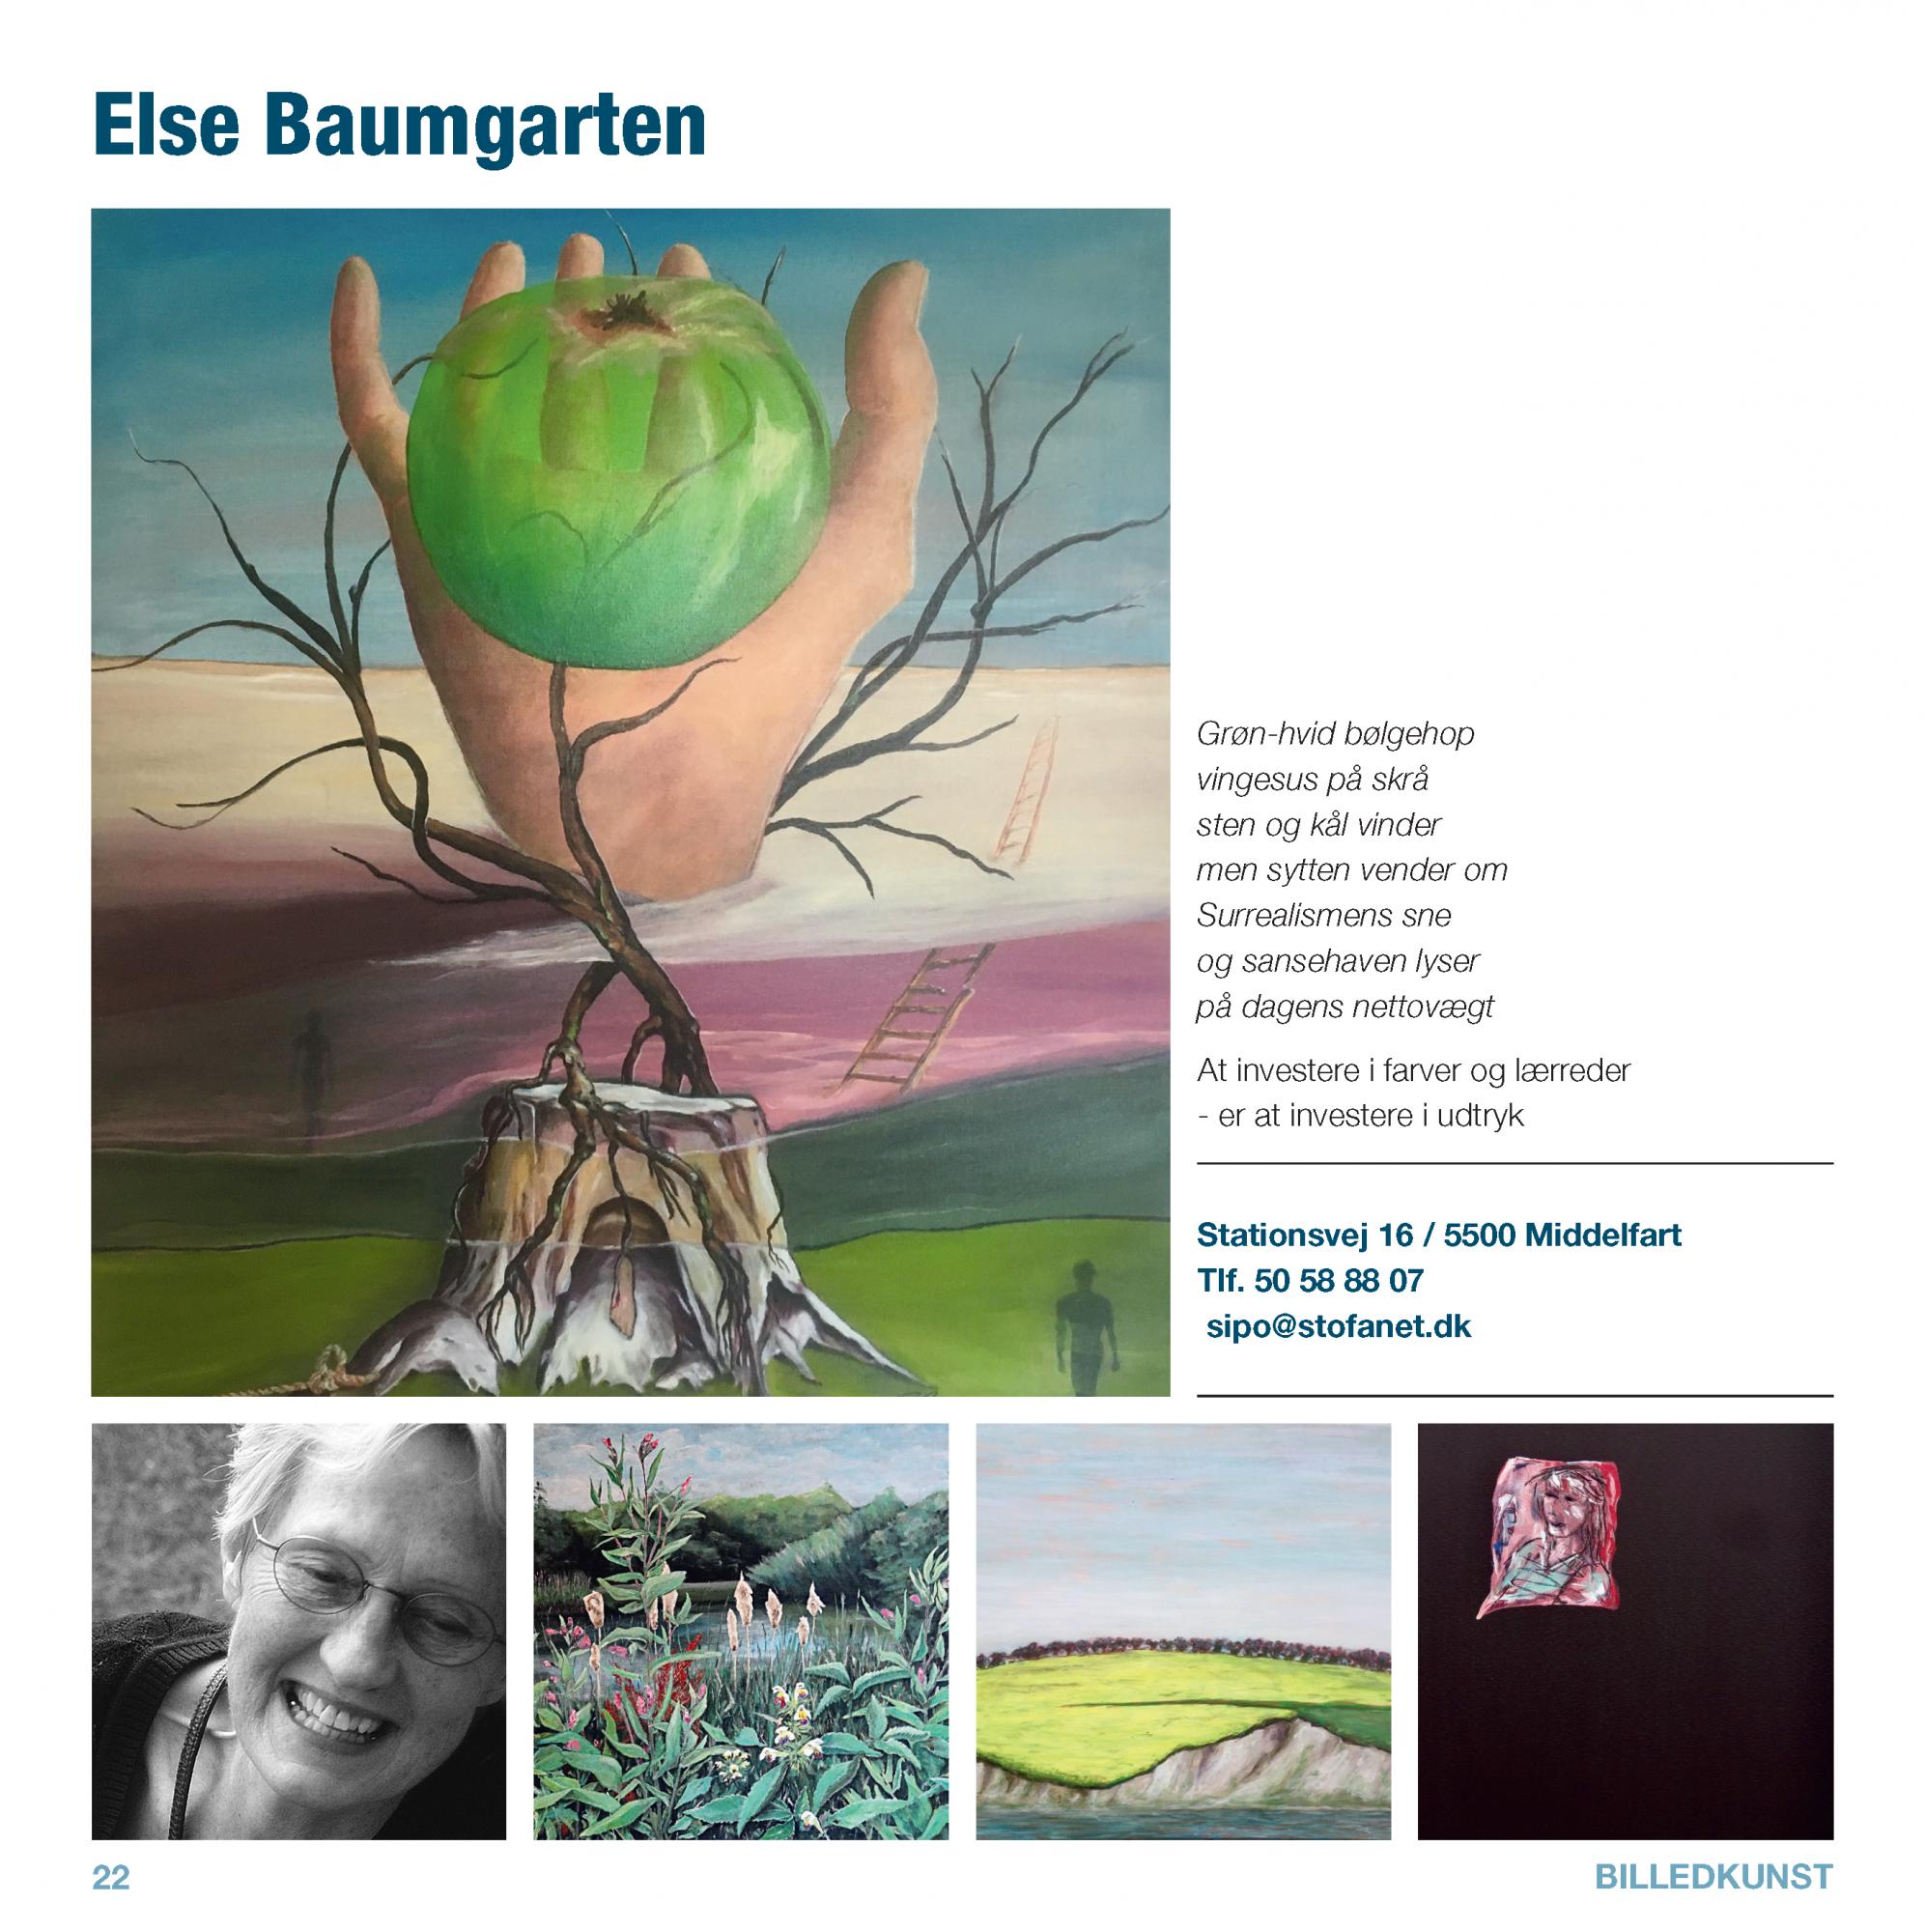 Kunstner Else Christiansen Baumgarten_Side_22